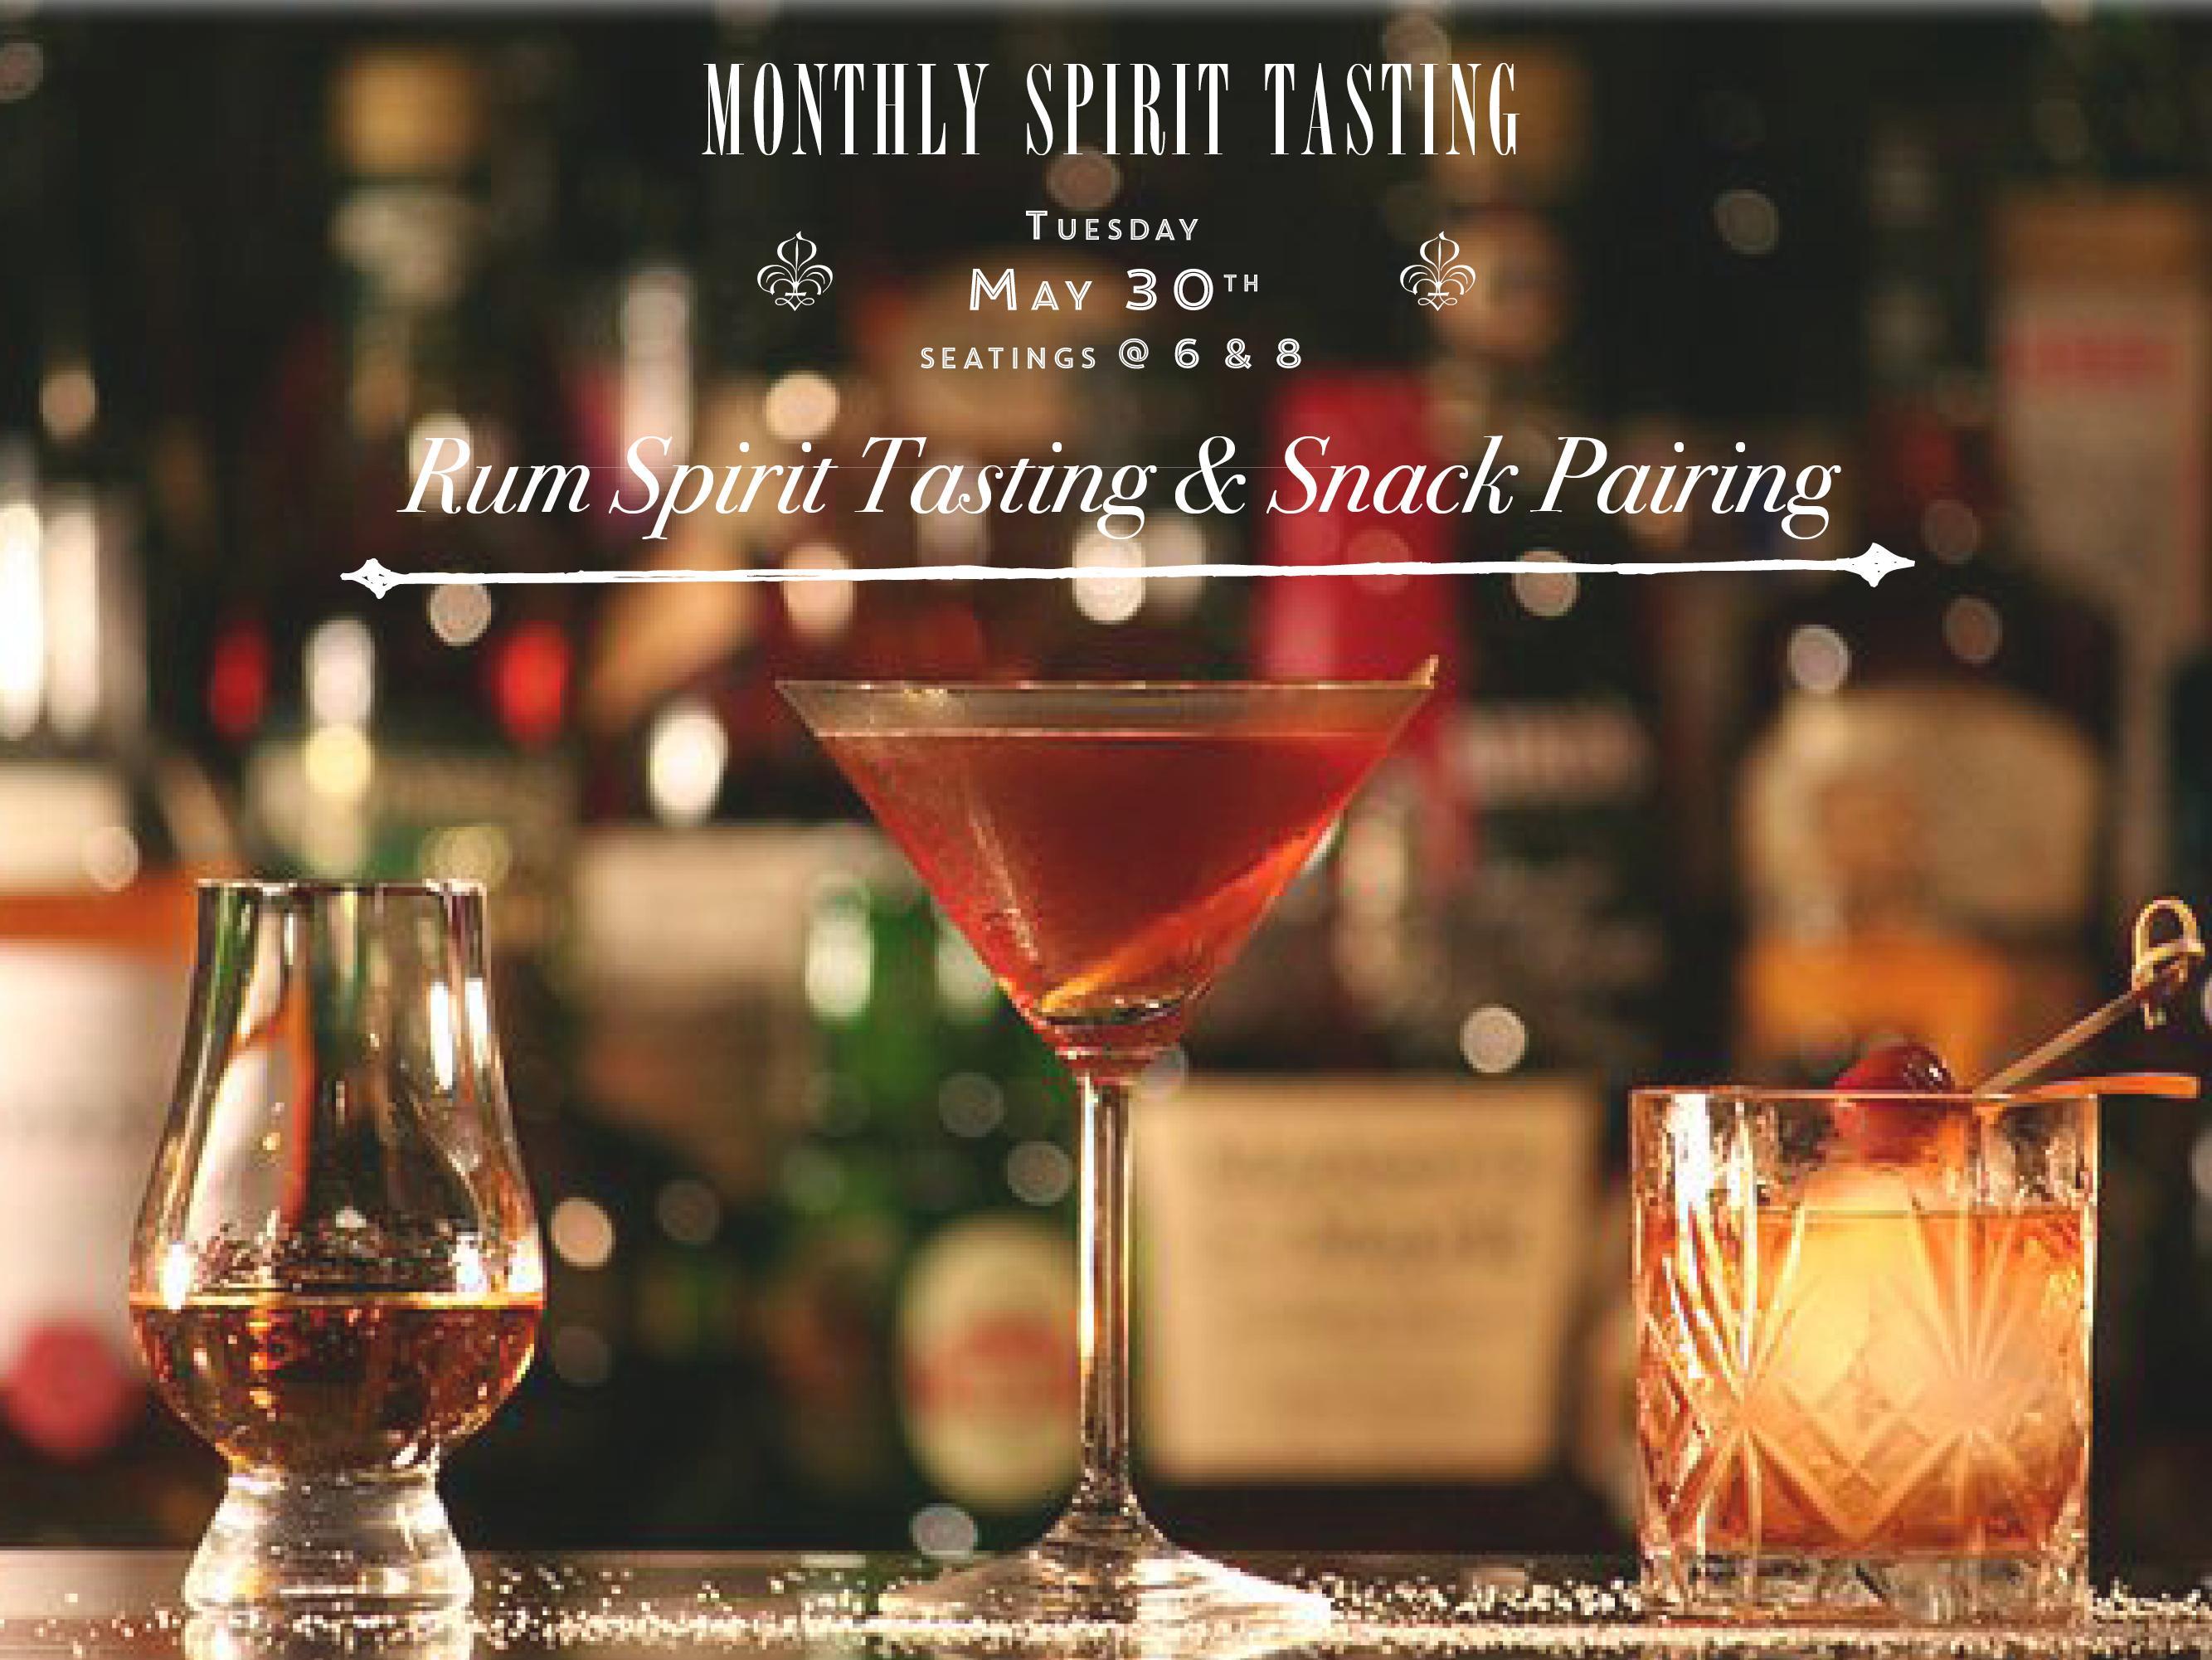 RUM Spirit Tasting & Snack Pairing